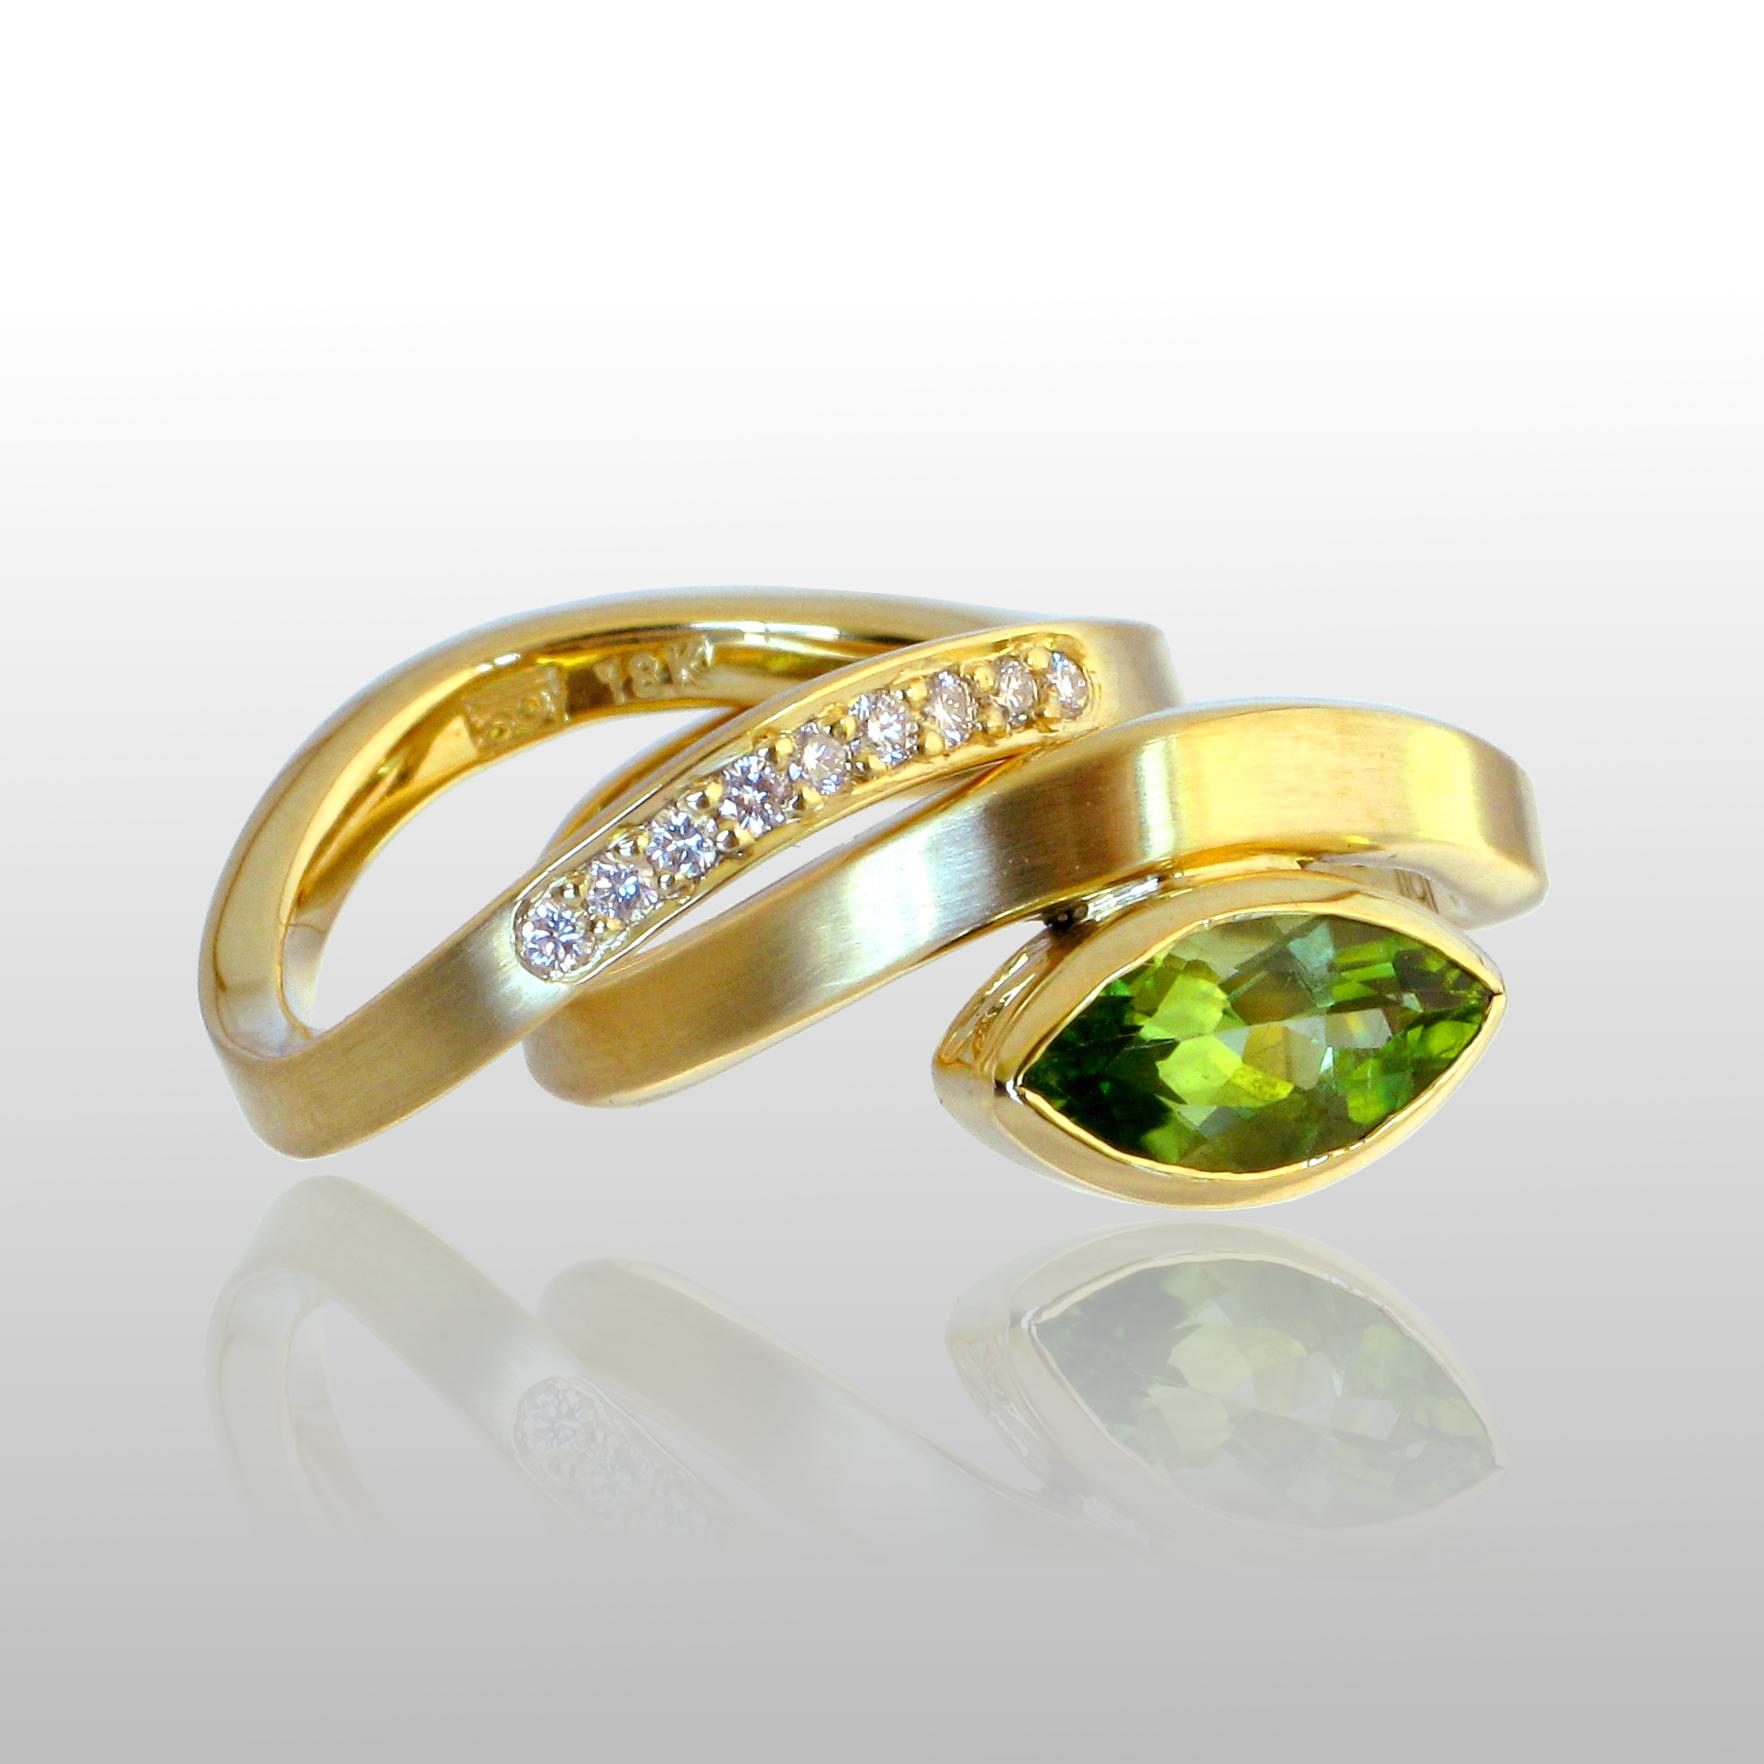 Contemporary 18k gold wedding band set 'Synergy' with peridot and diamonds by Pratima Design Fine Art Jewelry